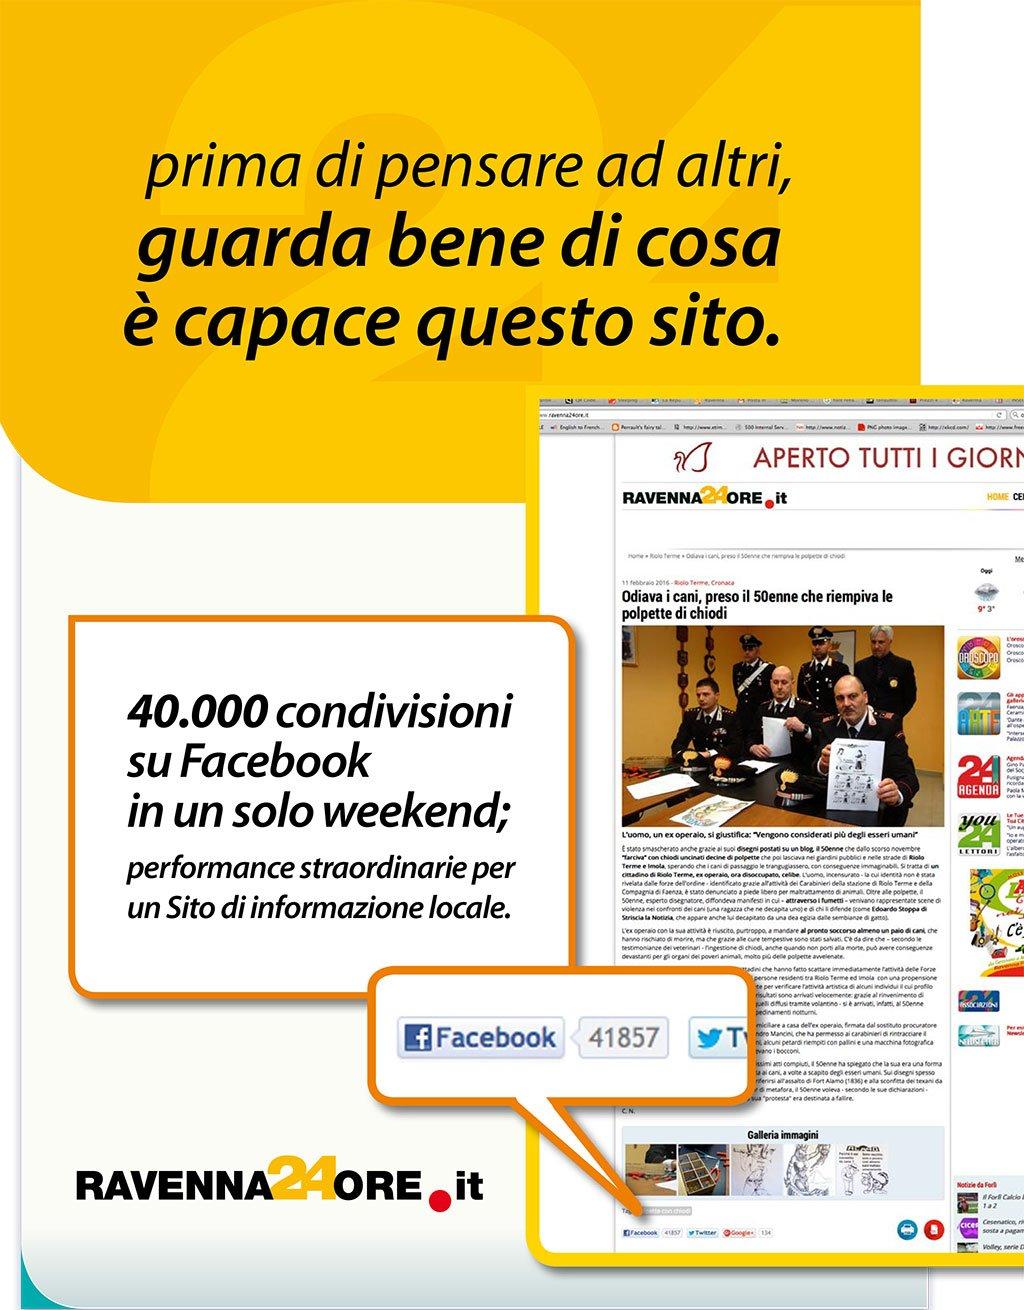 Oltre 40 mila condivisioni su Facebook